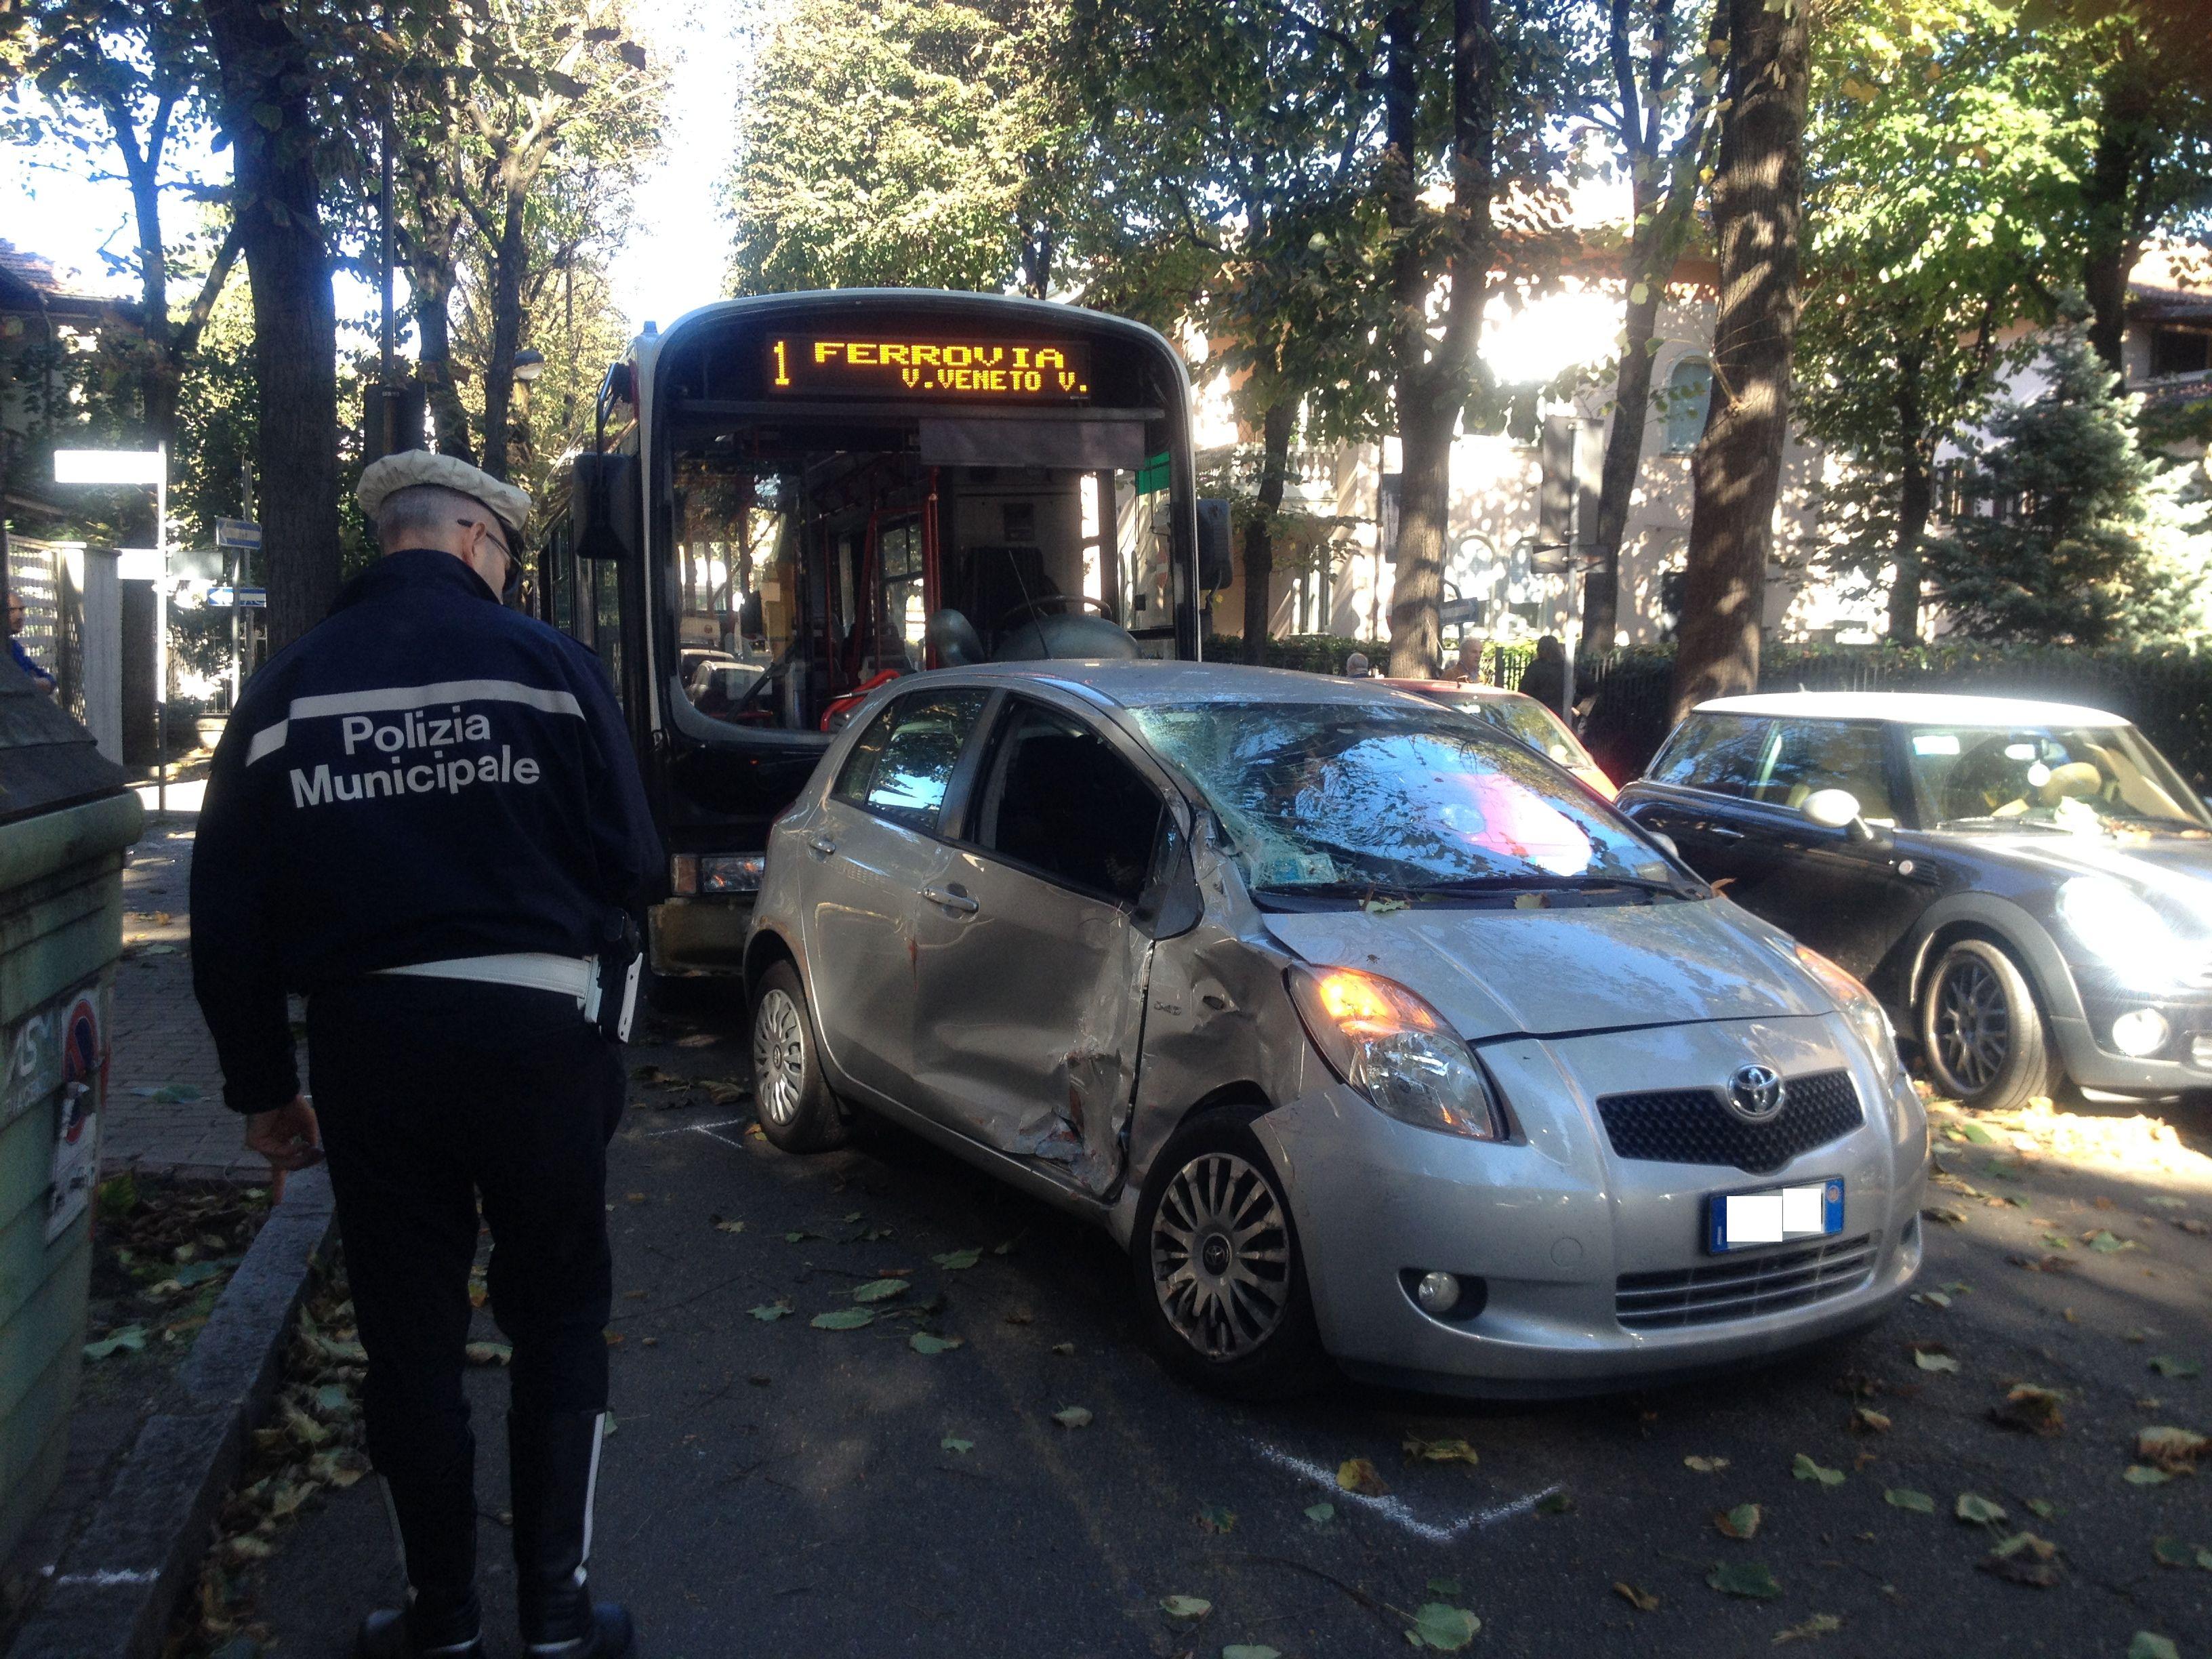 Scontro pullman e auto a un incrocio: paura tra i passeggeri